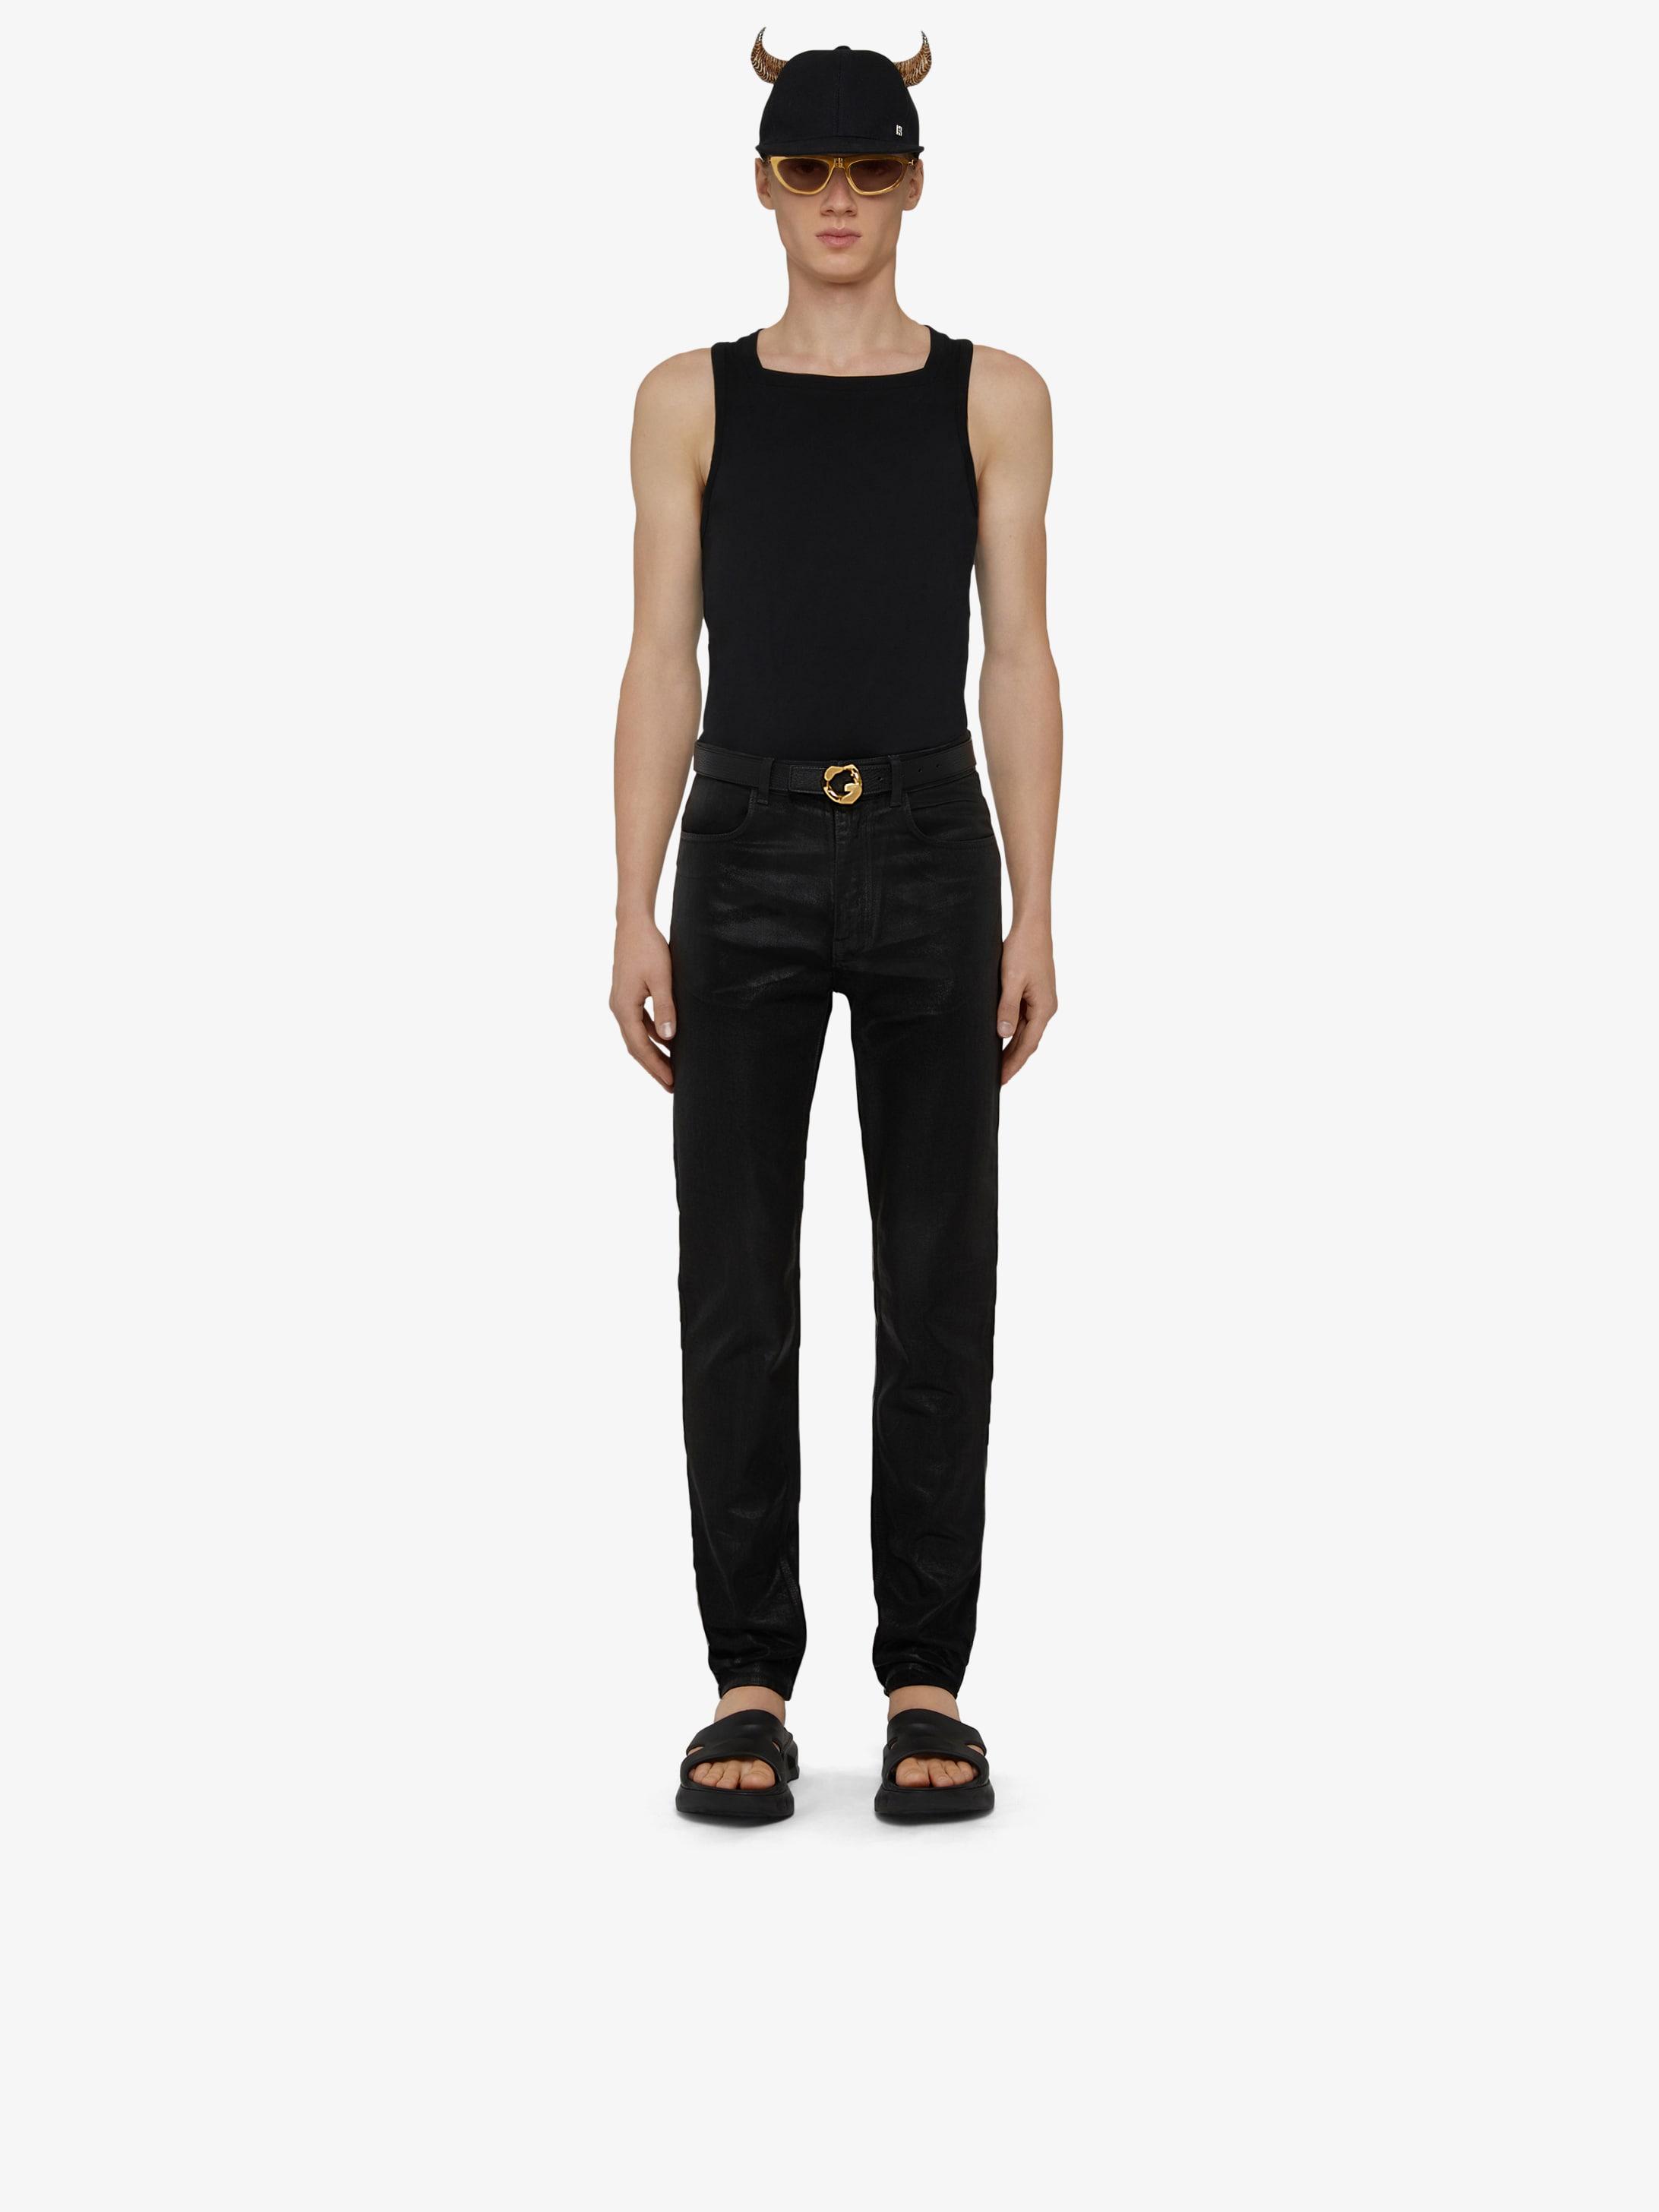 Slim fit jeans in shiny polished denim